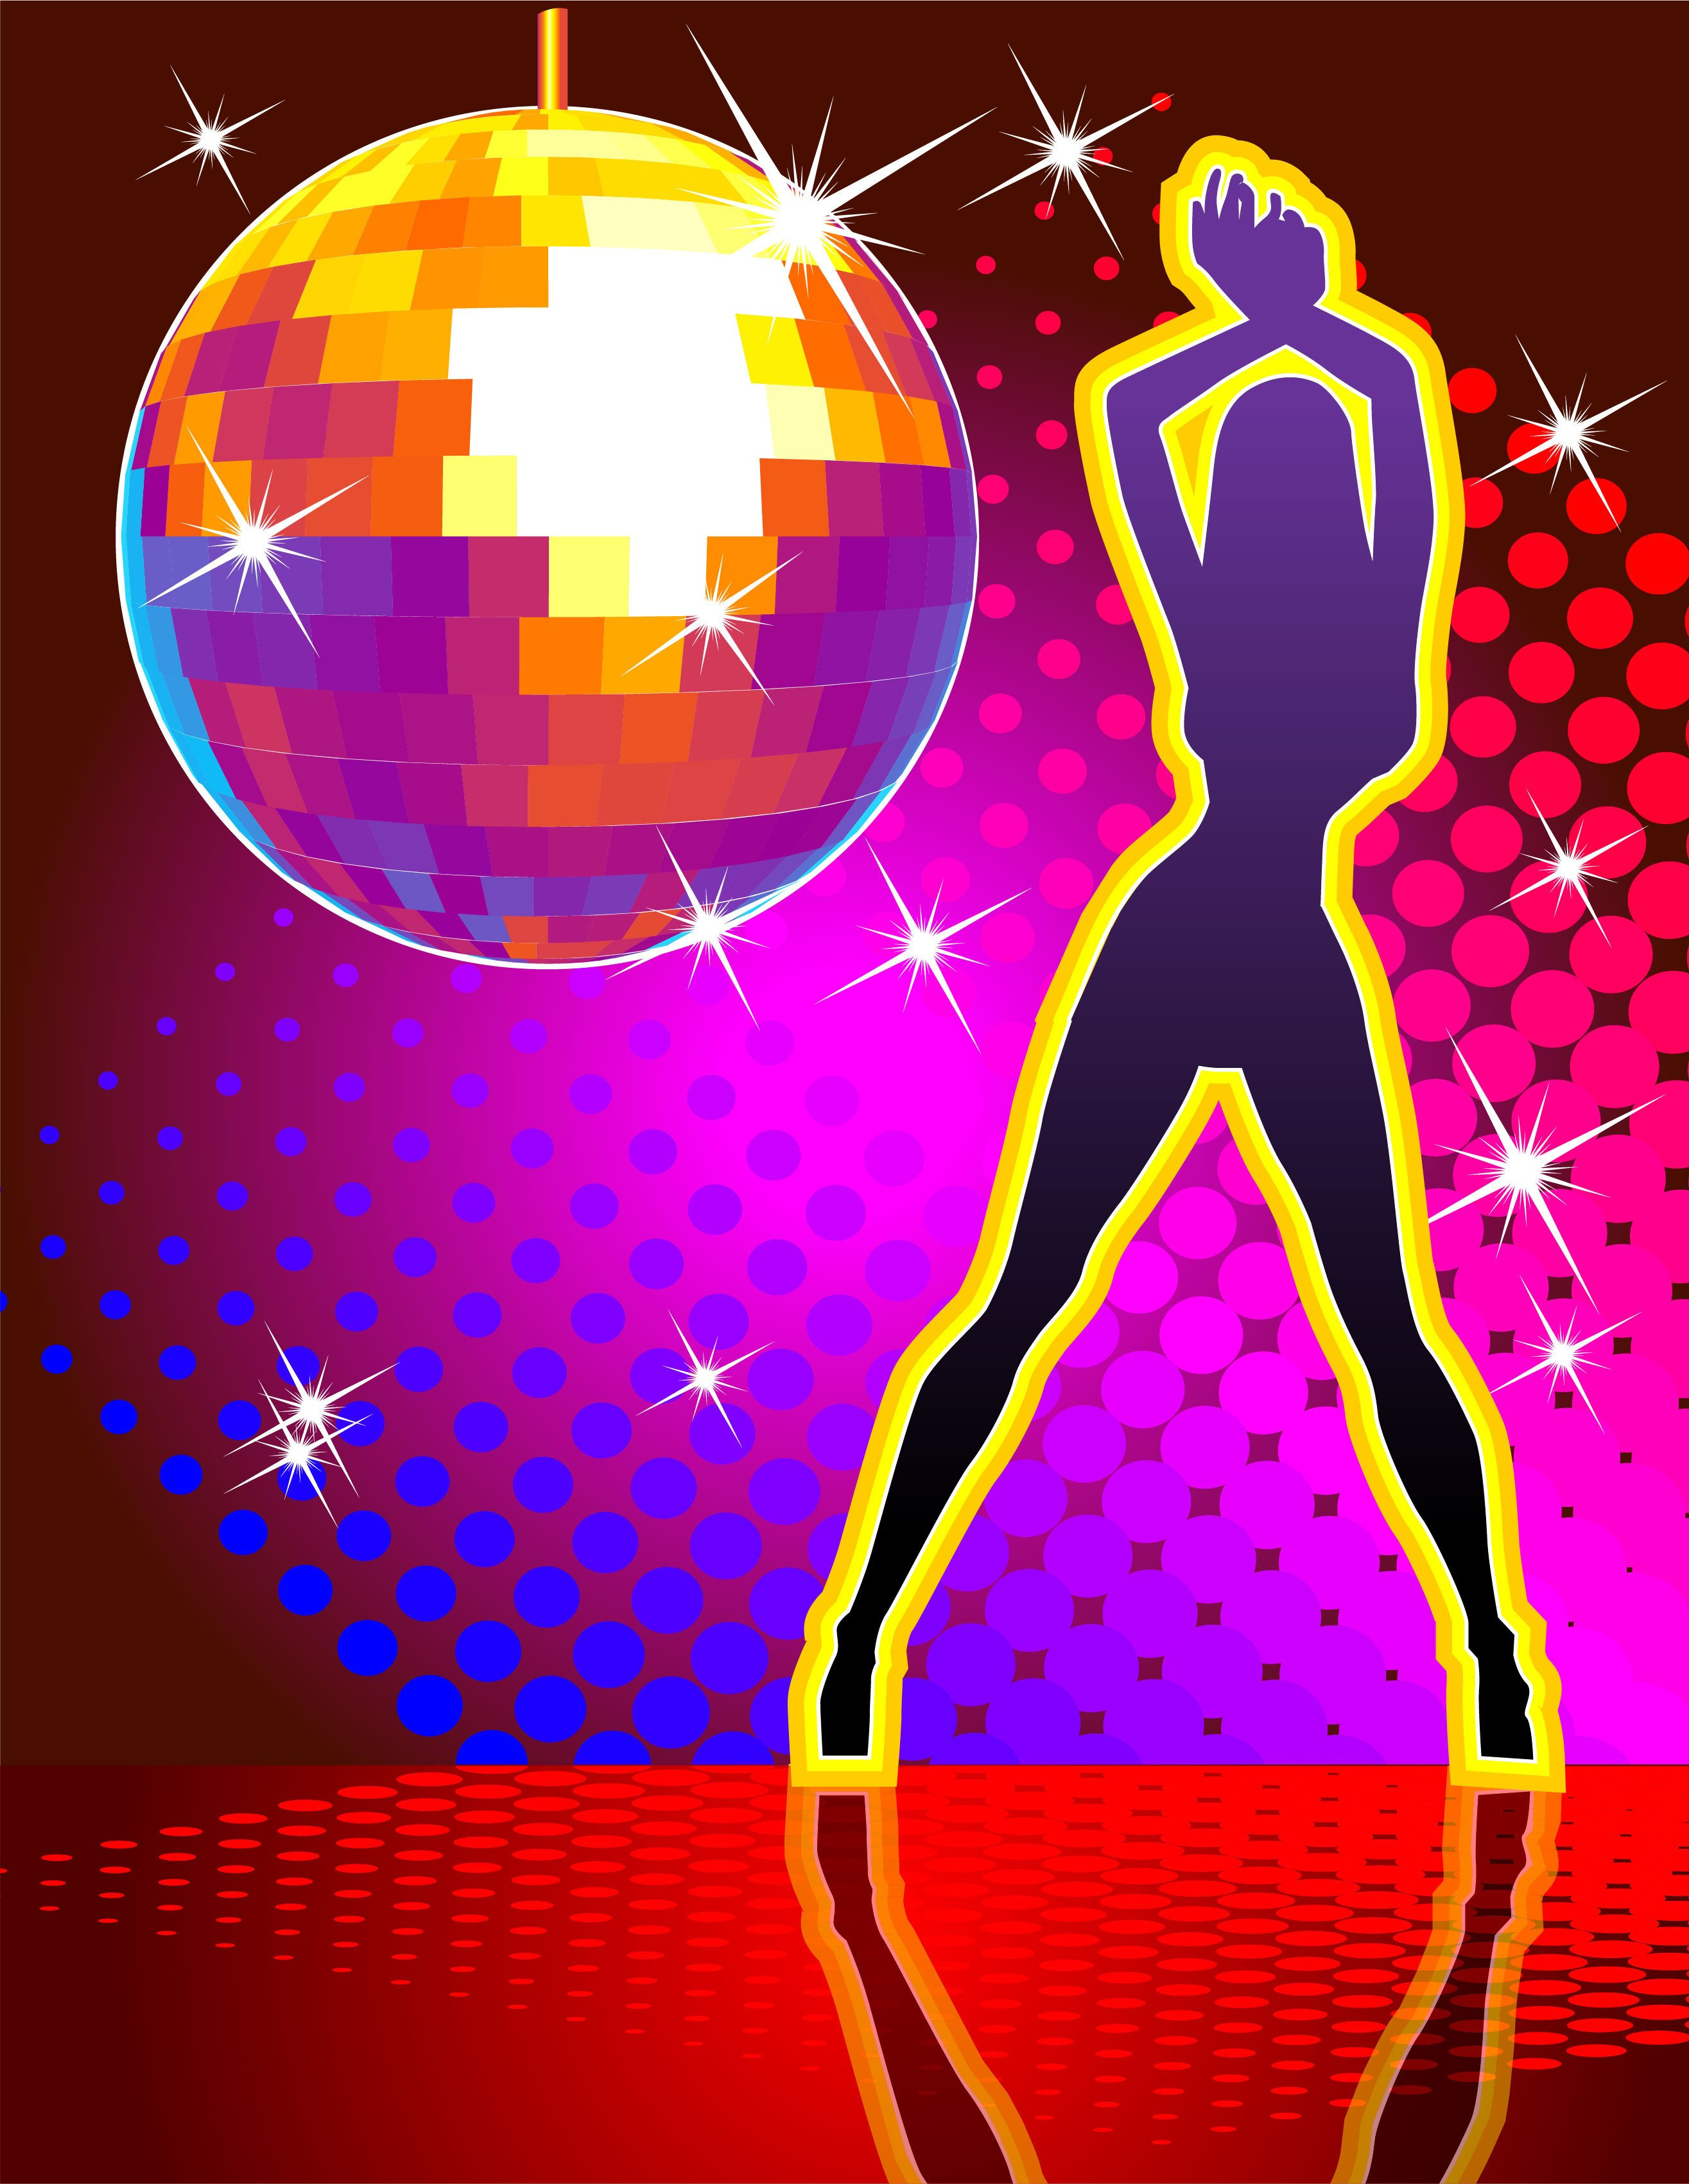 Prop Disco Sign Purple Disco Girl & Ball 1.2m x 0.9m $45 incl gst